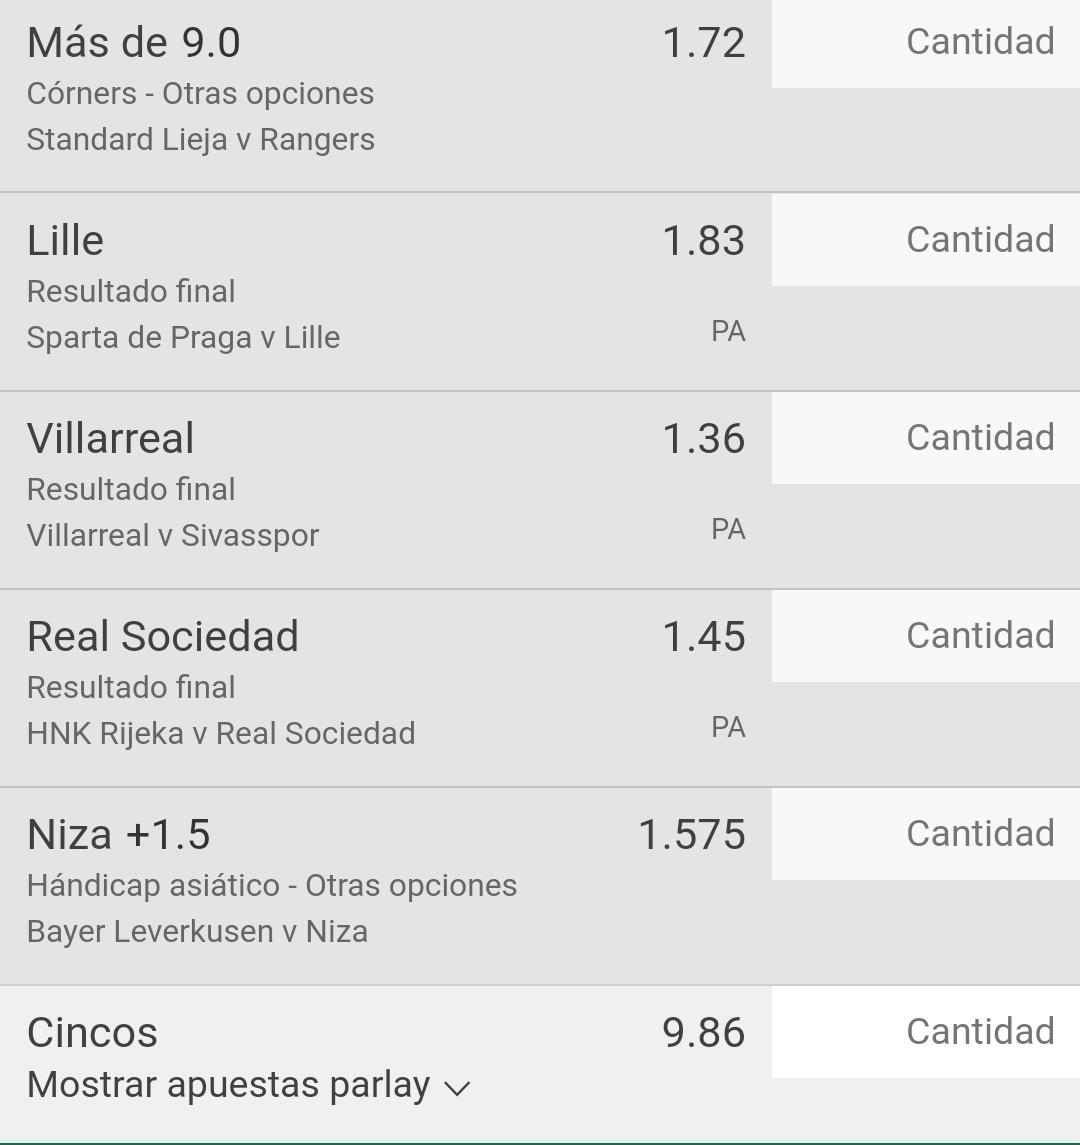 Buen día, vamos con 3 picks oficiales para #EuroLeague y dejo 2 parlays para intentar hoy. 🤞🍀  📍Celtic vs Milan  📌Milan mas de 1 gol (1.83) 2%  📍Sparta vs Lille  📌Lille ML (1.83) 1.5%  📍Standard L vs Rangers  📌Mas de 9 corners (1.72) 1.5 %  #FreePicks https://t.co/UZ8qVGs4T5